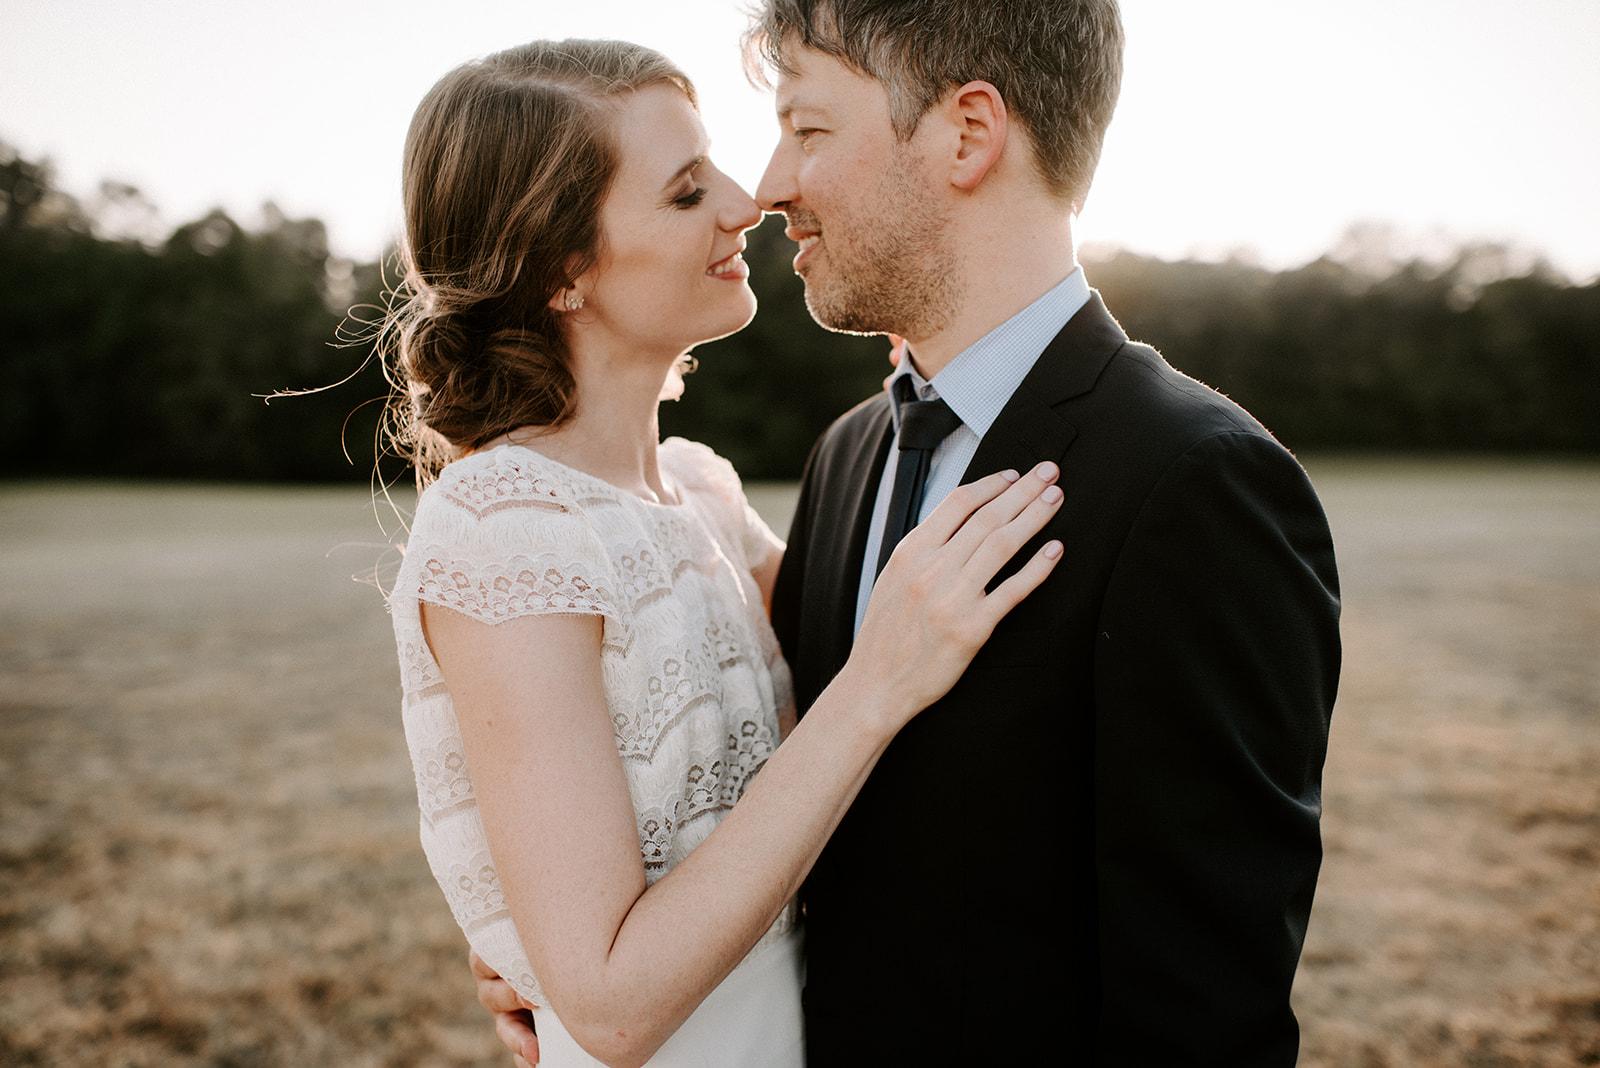 Savannah Ashley Photography: Golden hour wedding photos